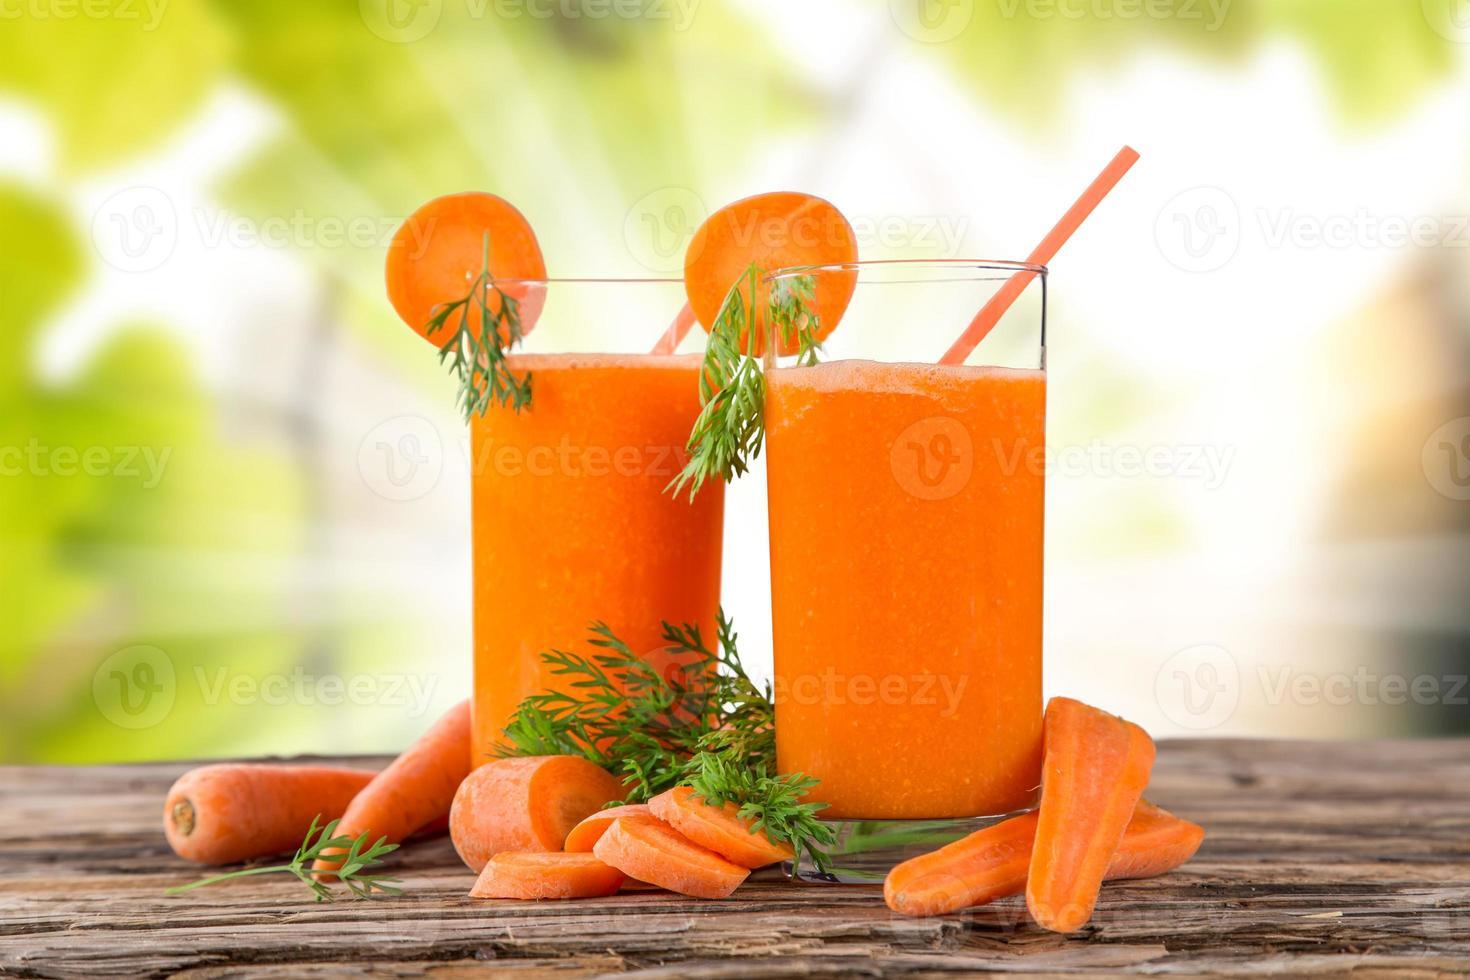 succo di carota fresco, bevande salutari. foto